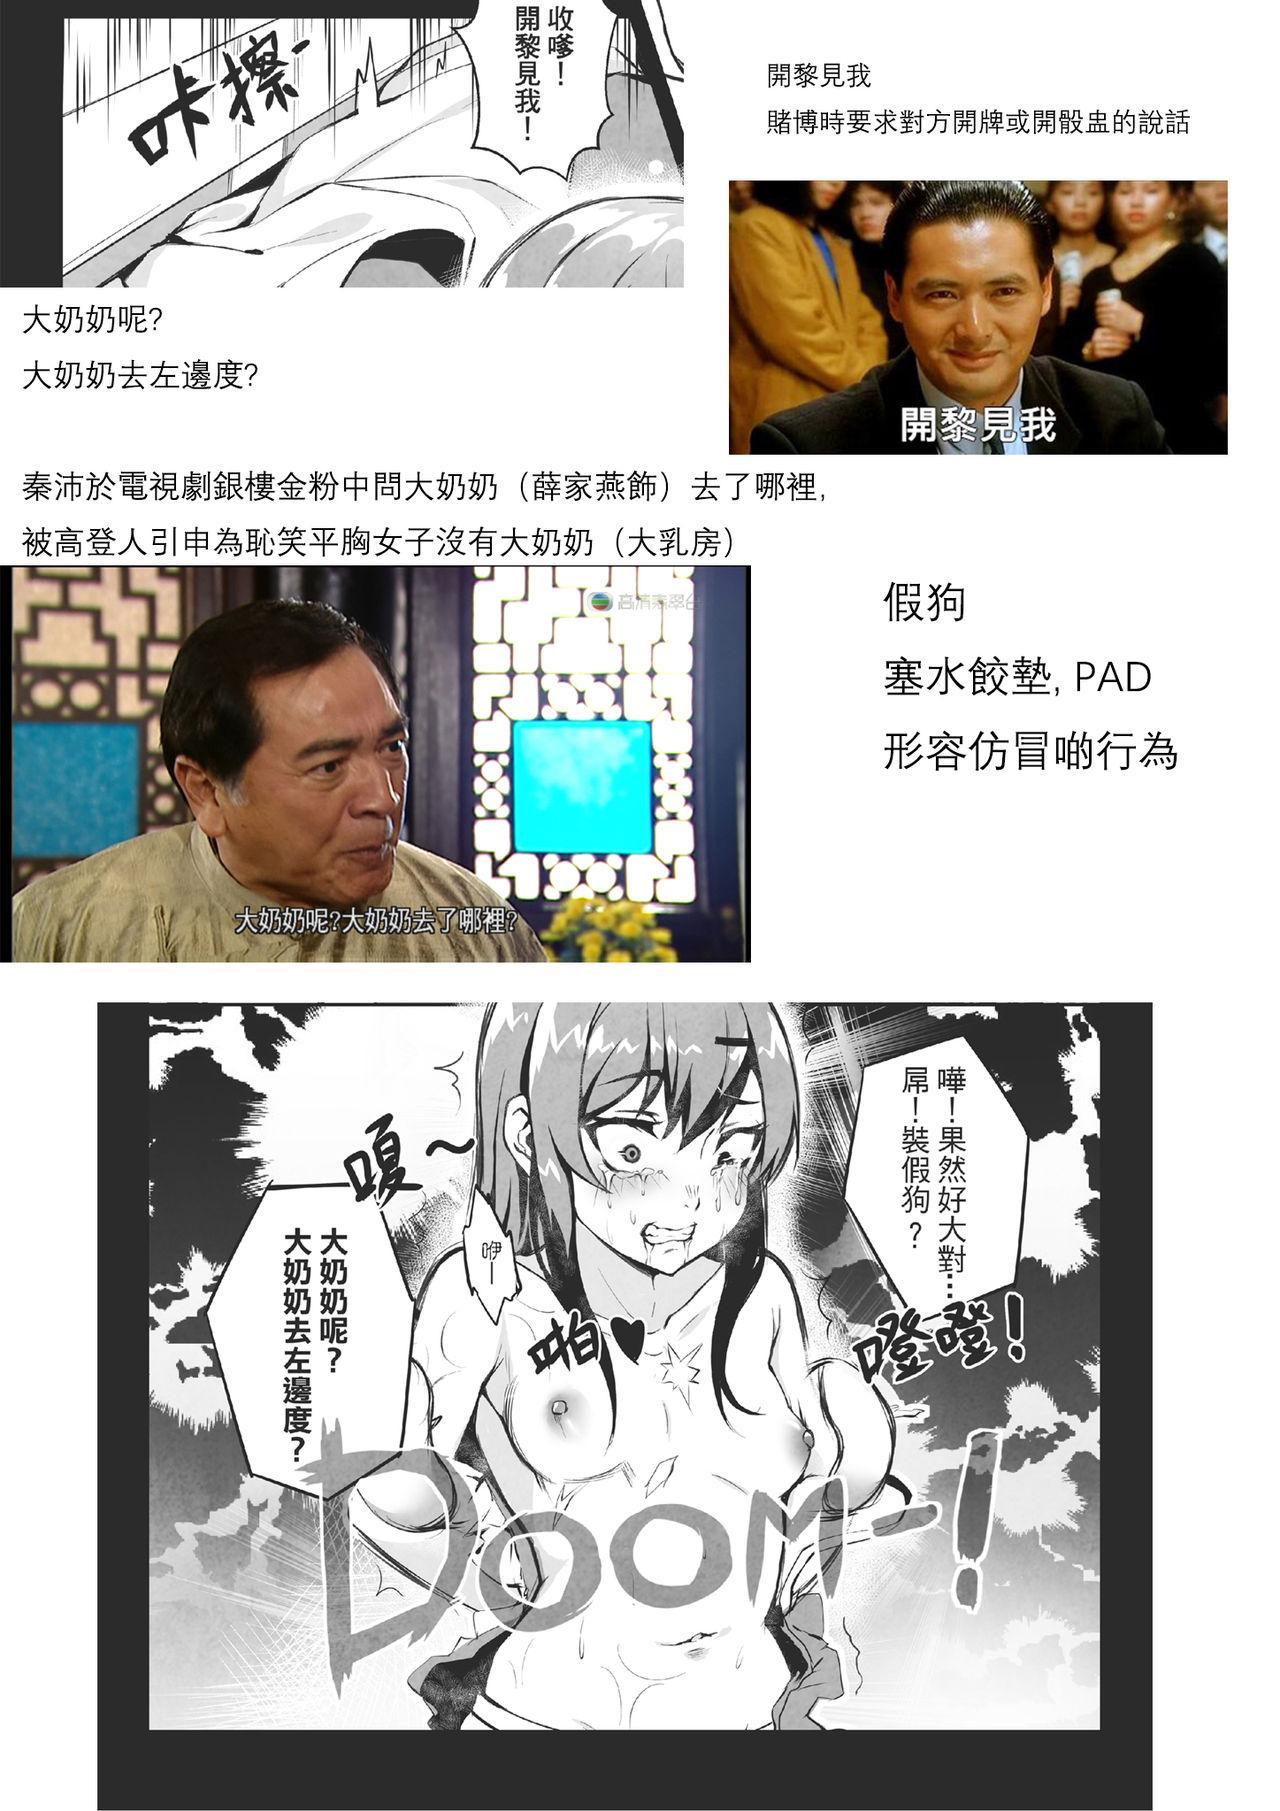 [Gantou Ikunoro] MK girl embodies the spirit of Hong Kong under the Lion Rock [Chinese]  [君廣東話本當上手機翻漢化組] v2 32